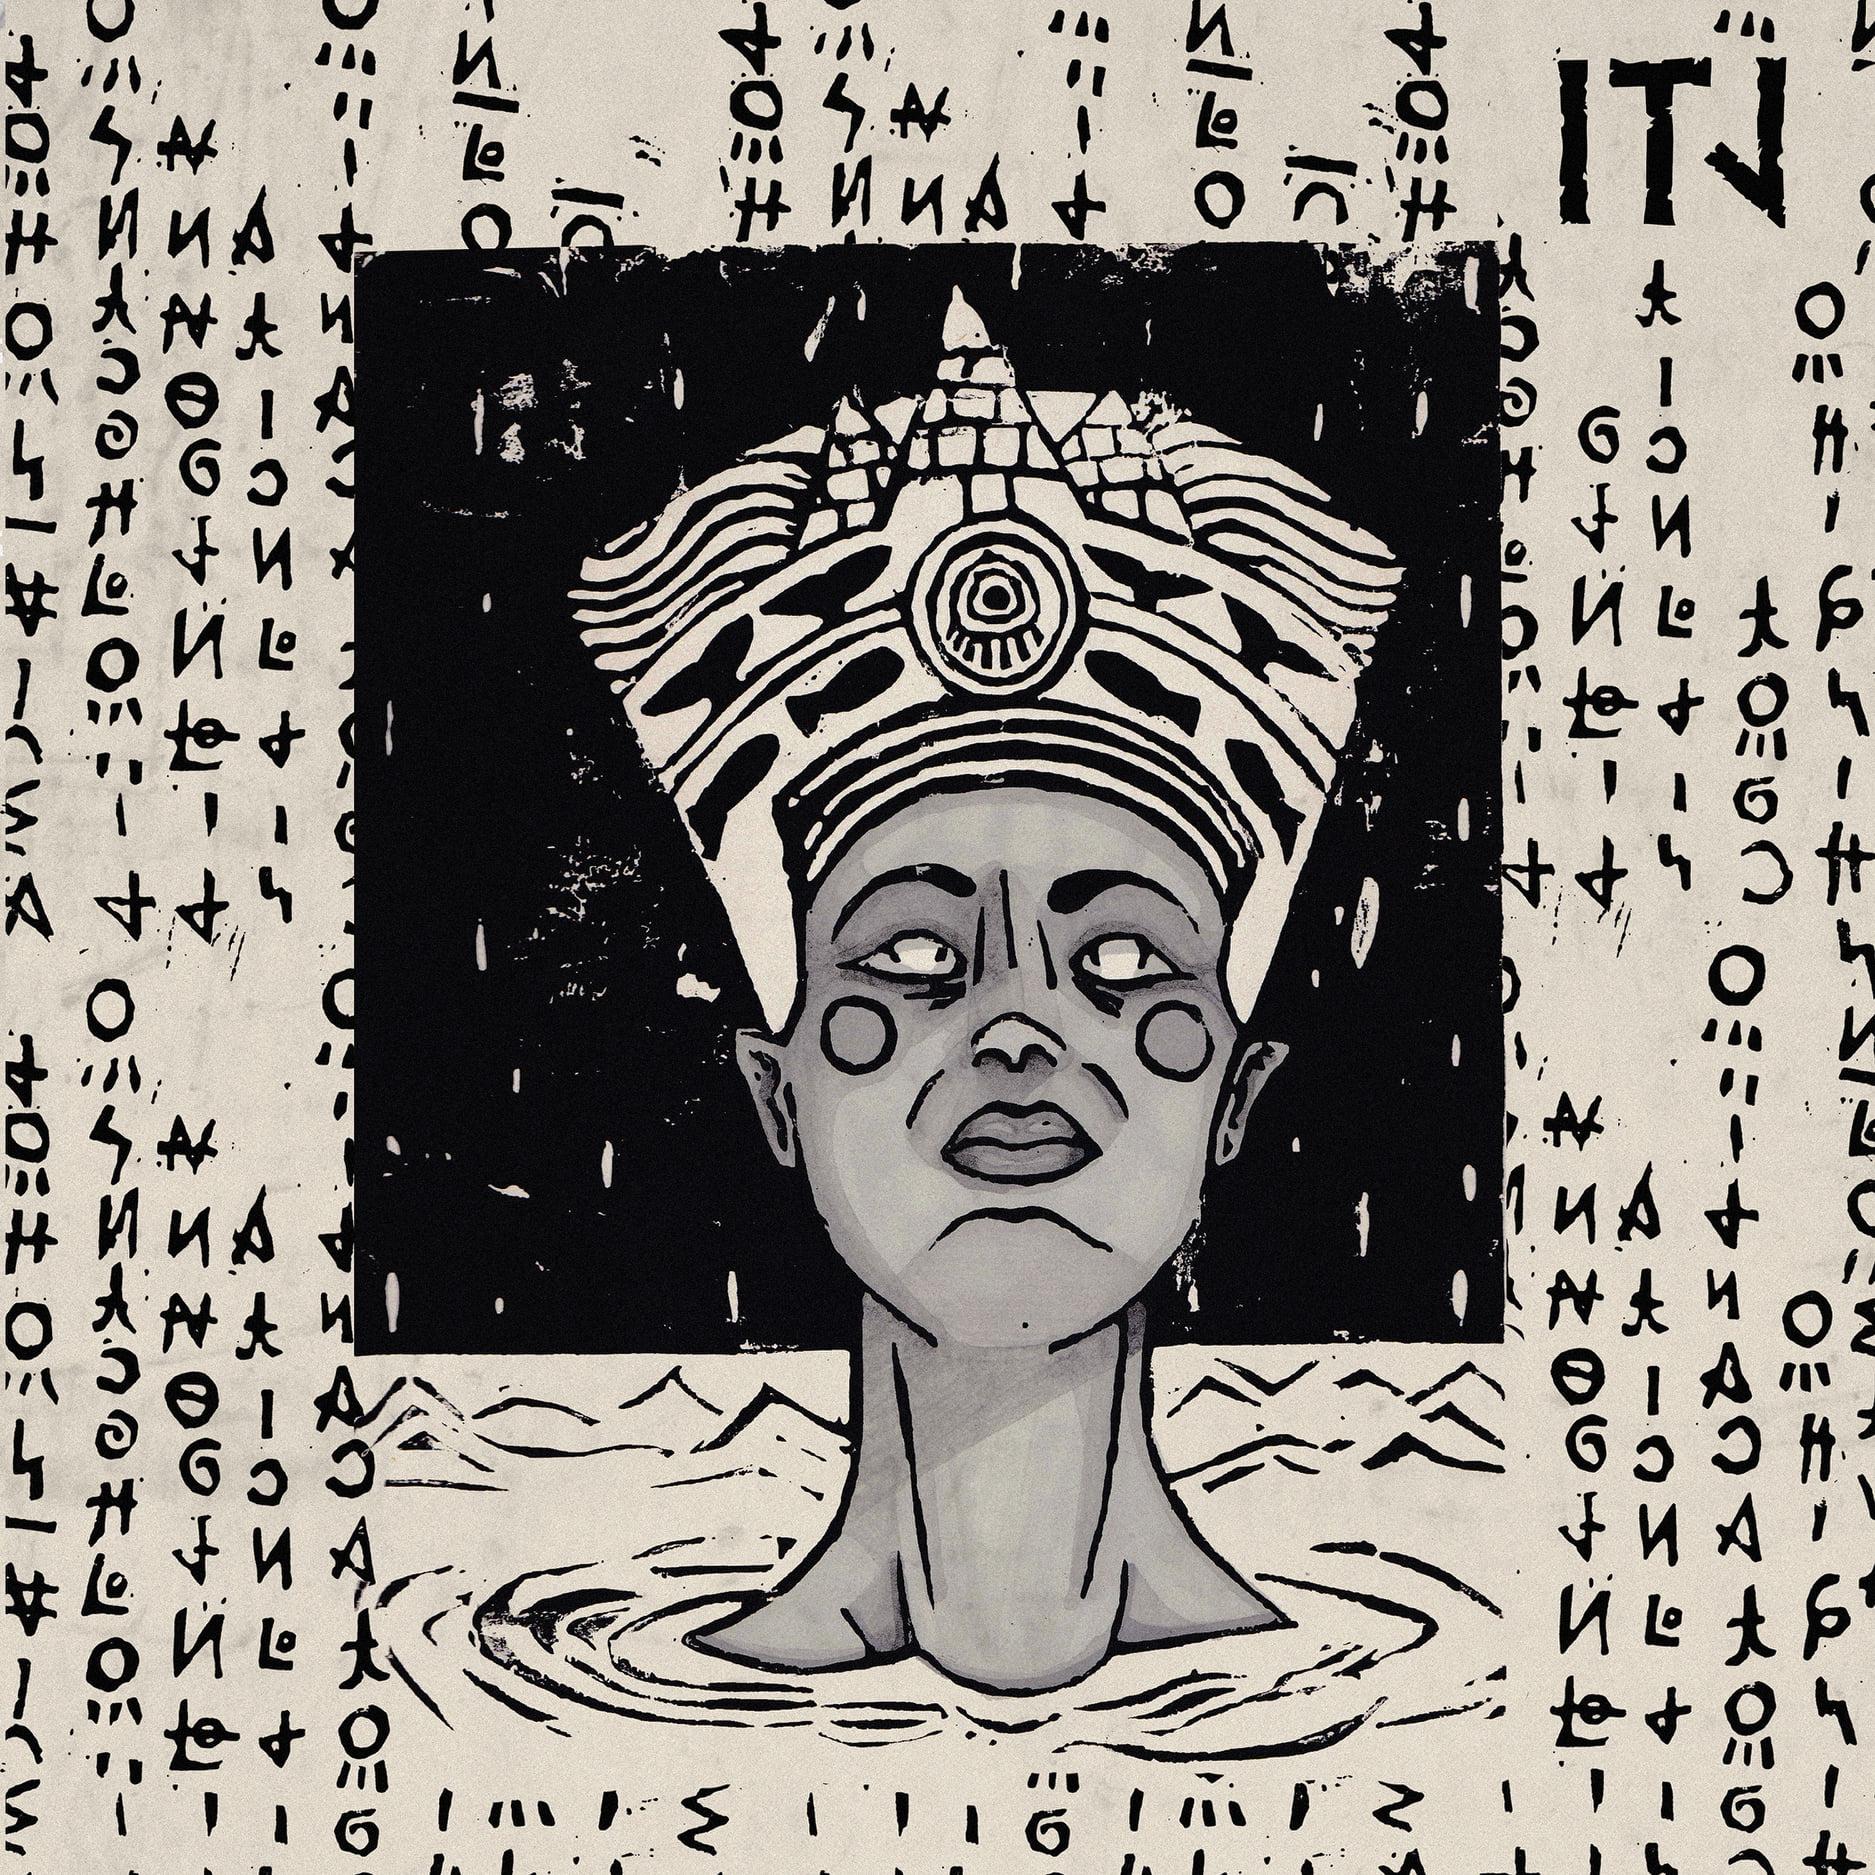 Itj - Abyss Nemet